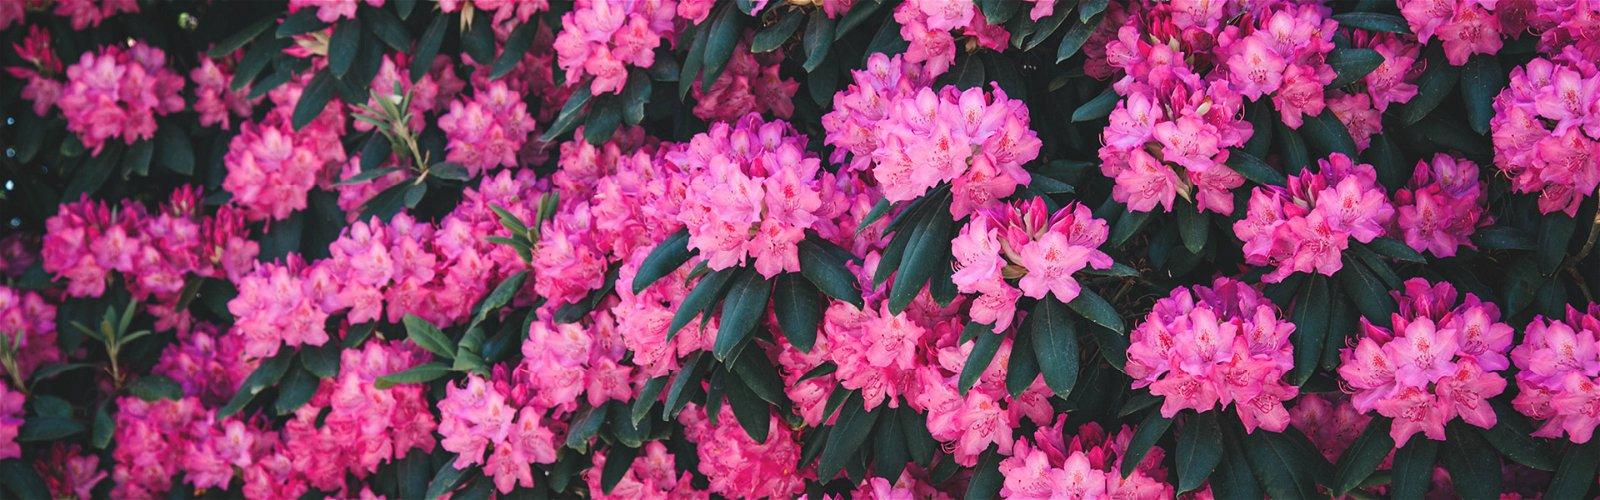 Rhododendronbusk